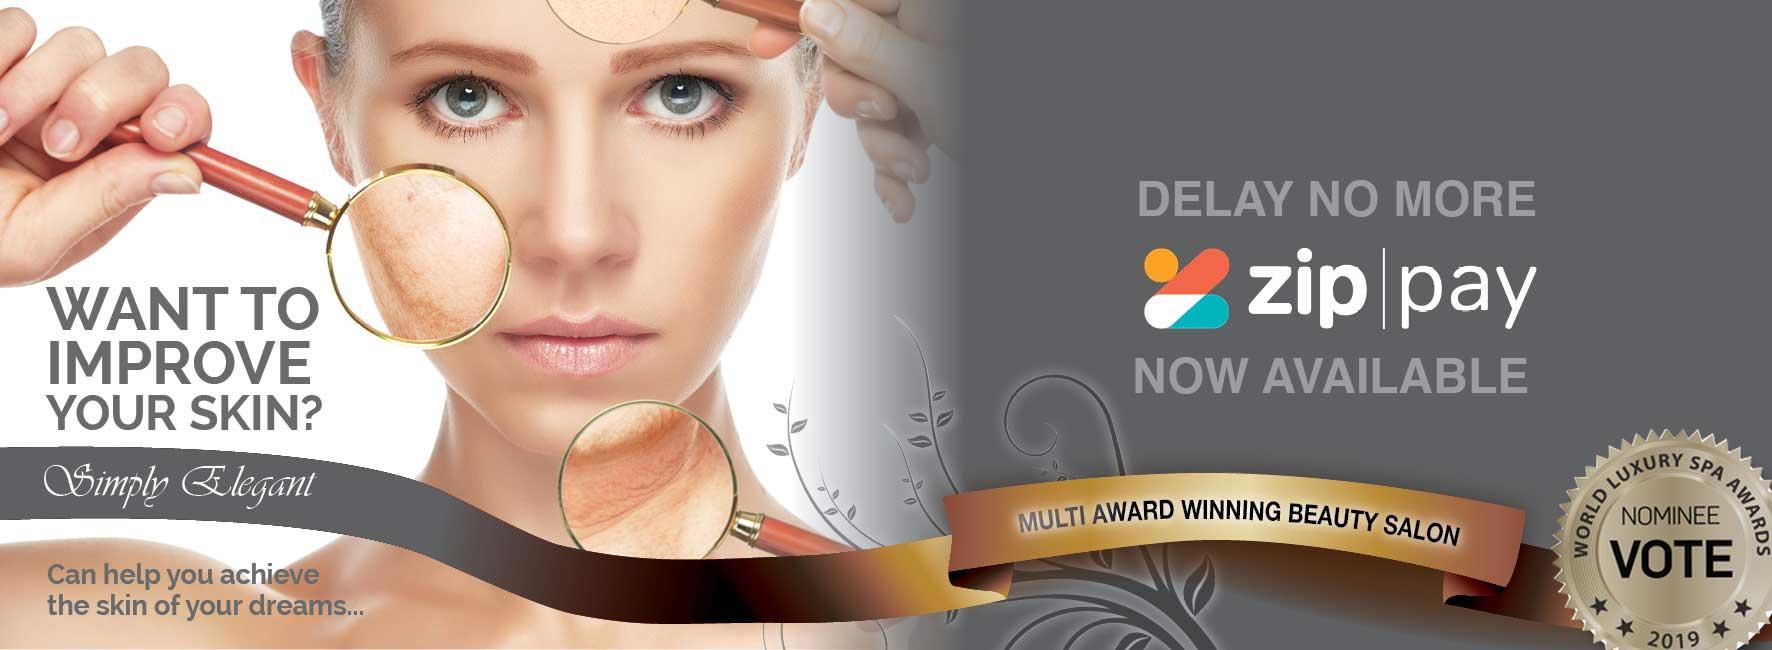 Simply-Elegant-WEBSITE-Extra-web-sliders-promoting-ZipPay